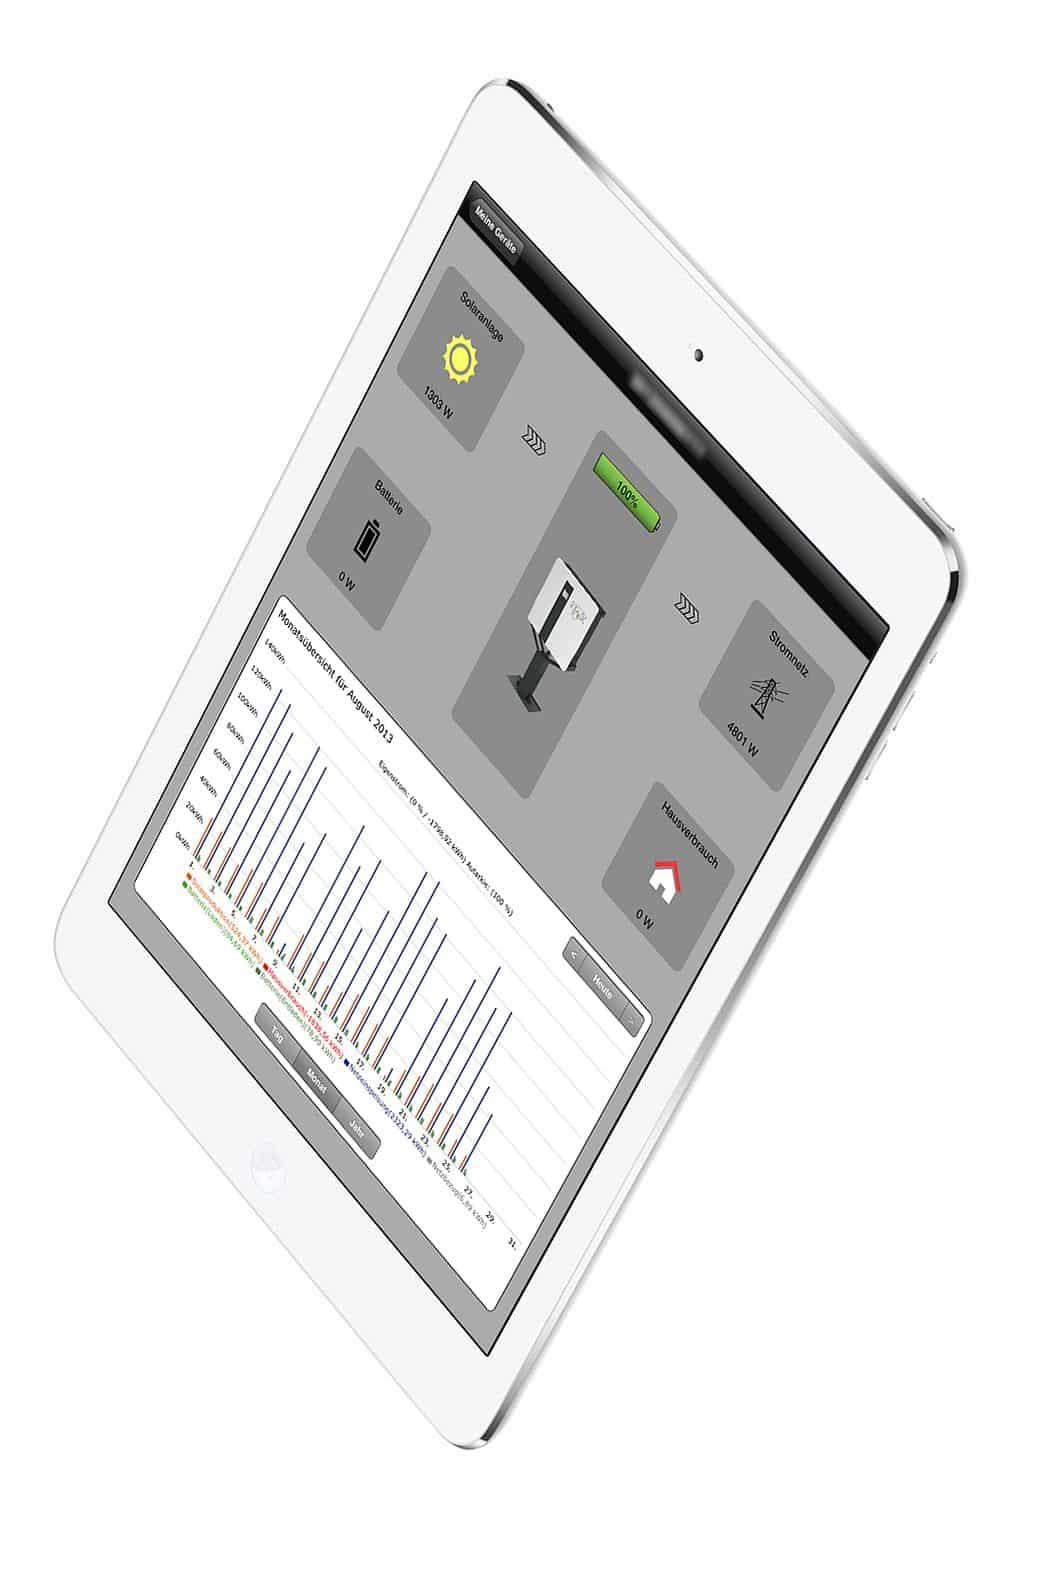 E3DC_iPad-App